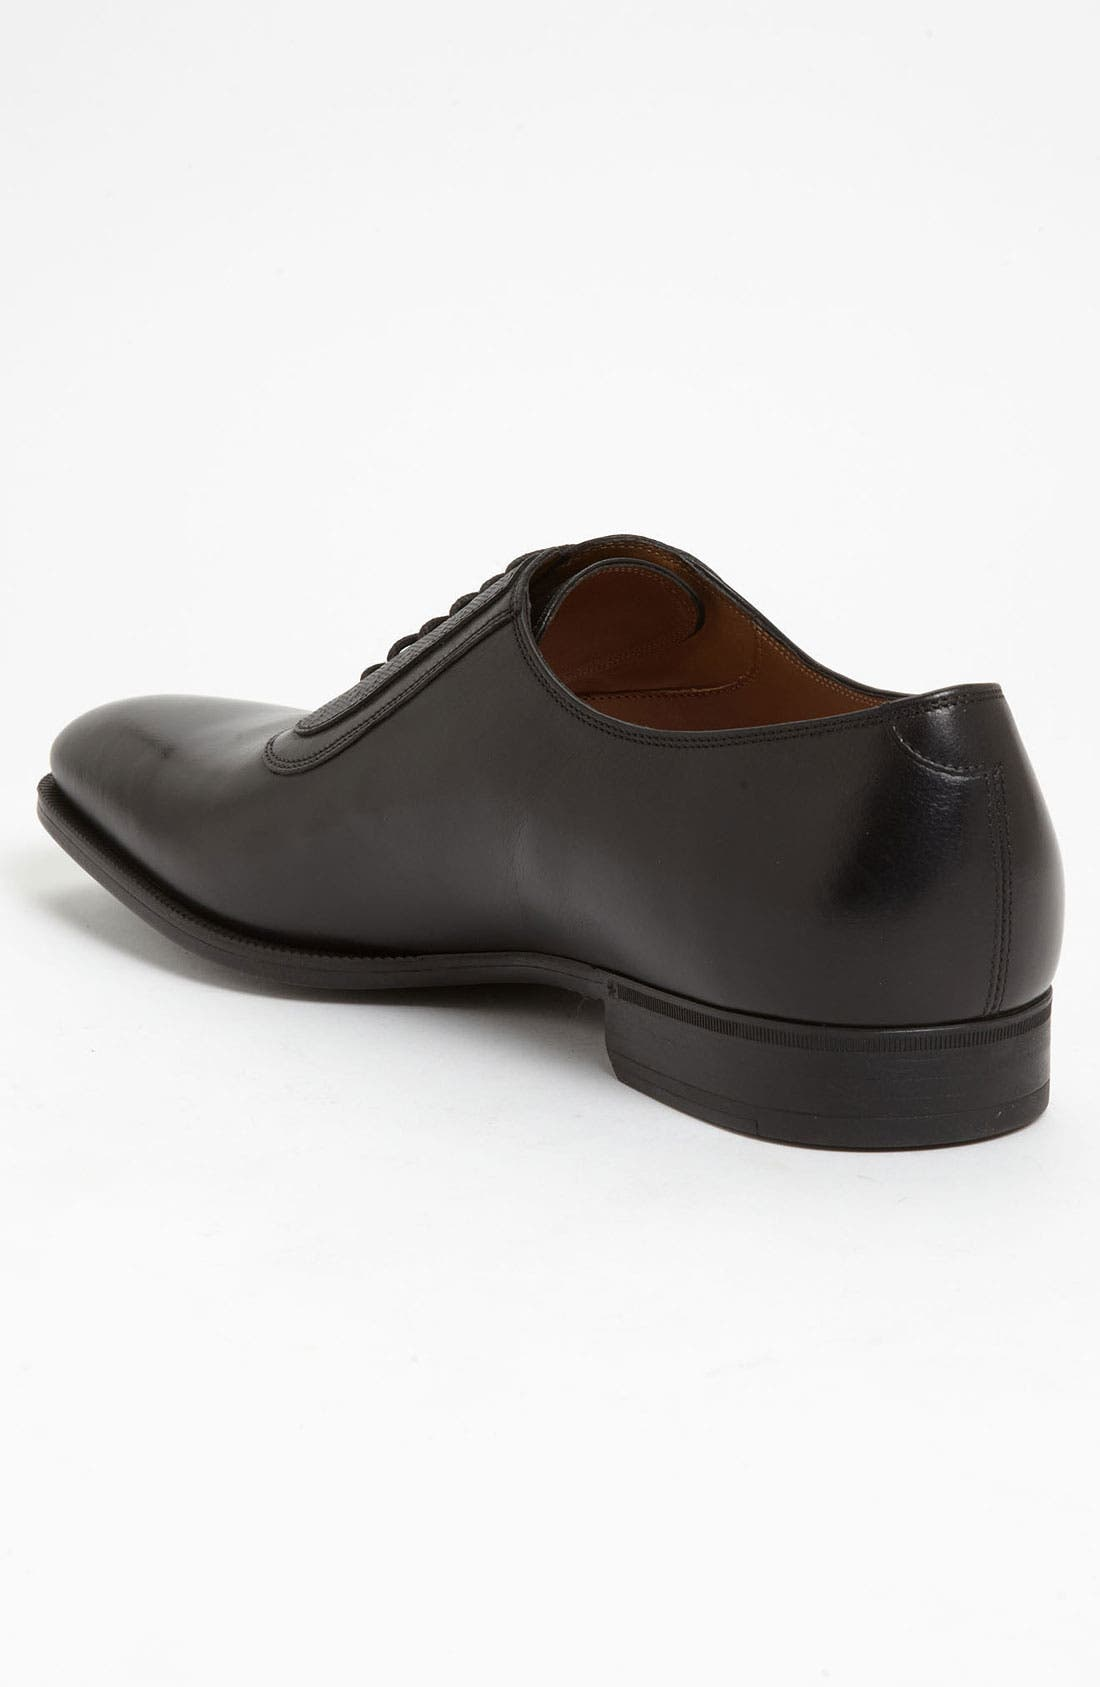 Alternate Image 2  - Gucci 'Noort' Plain Toe Oxford